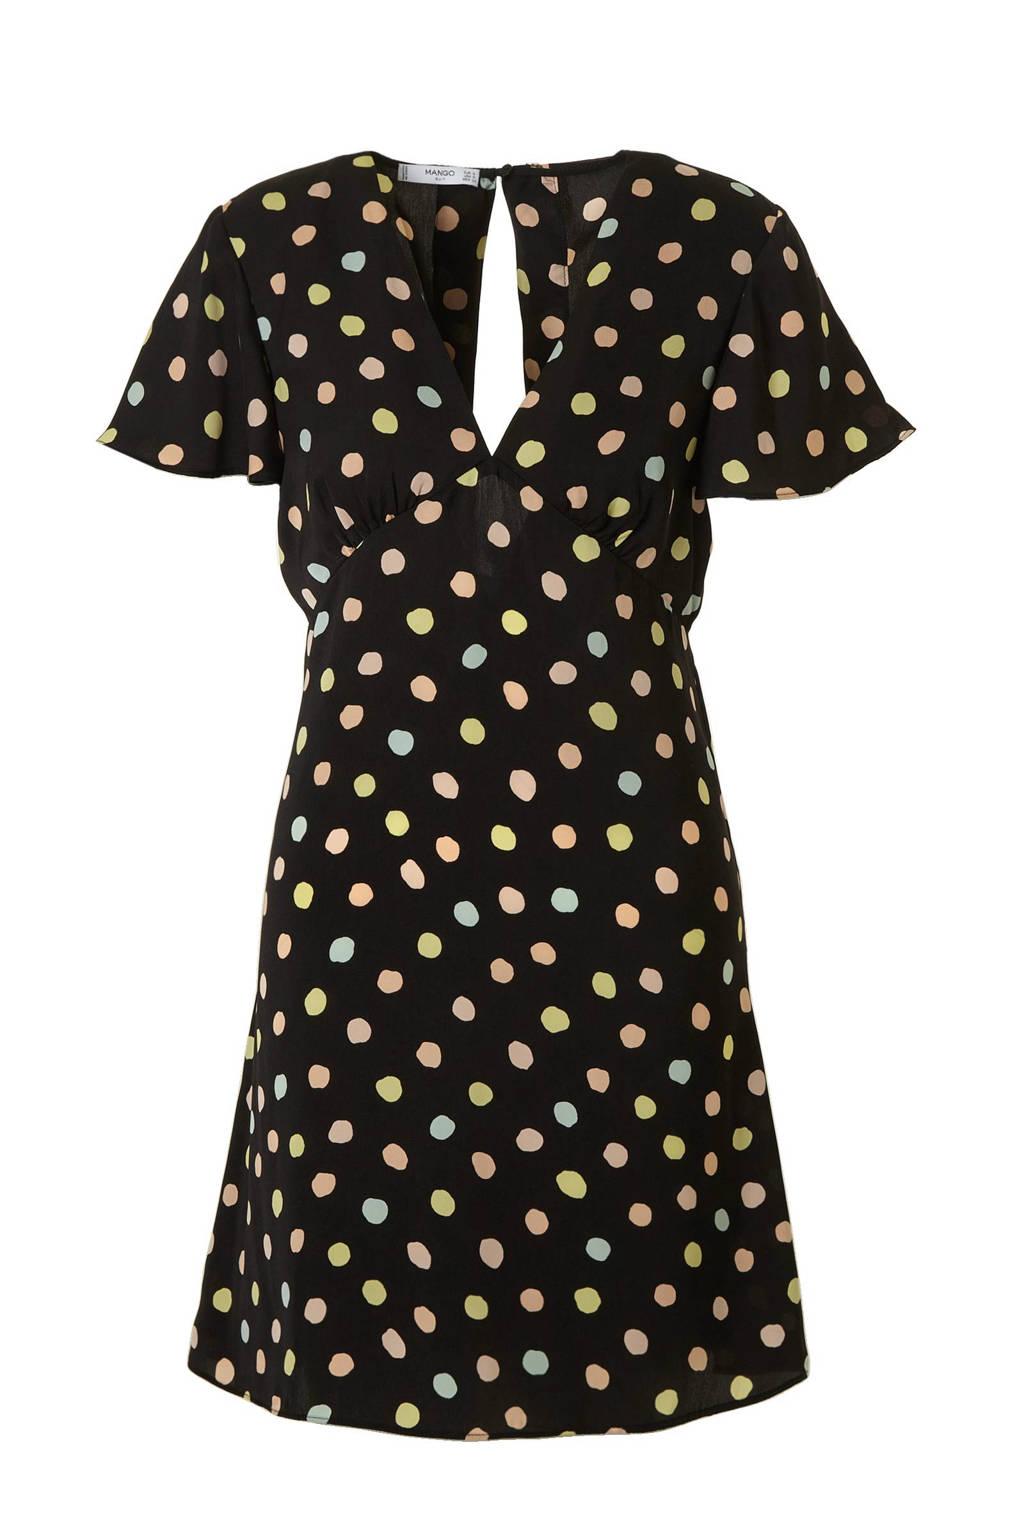 Mango jurk met stippen zwart, Zwart/roze/geel